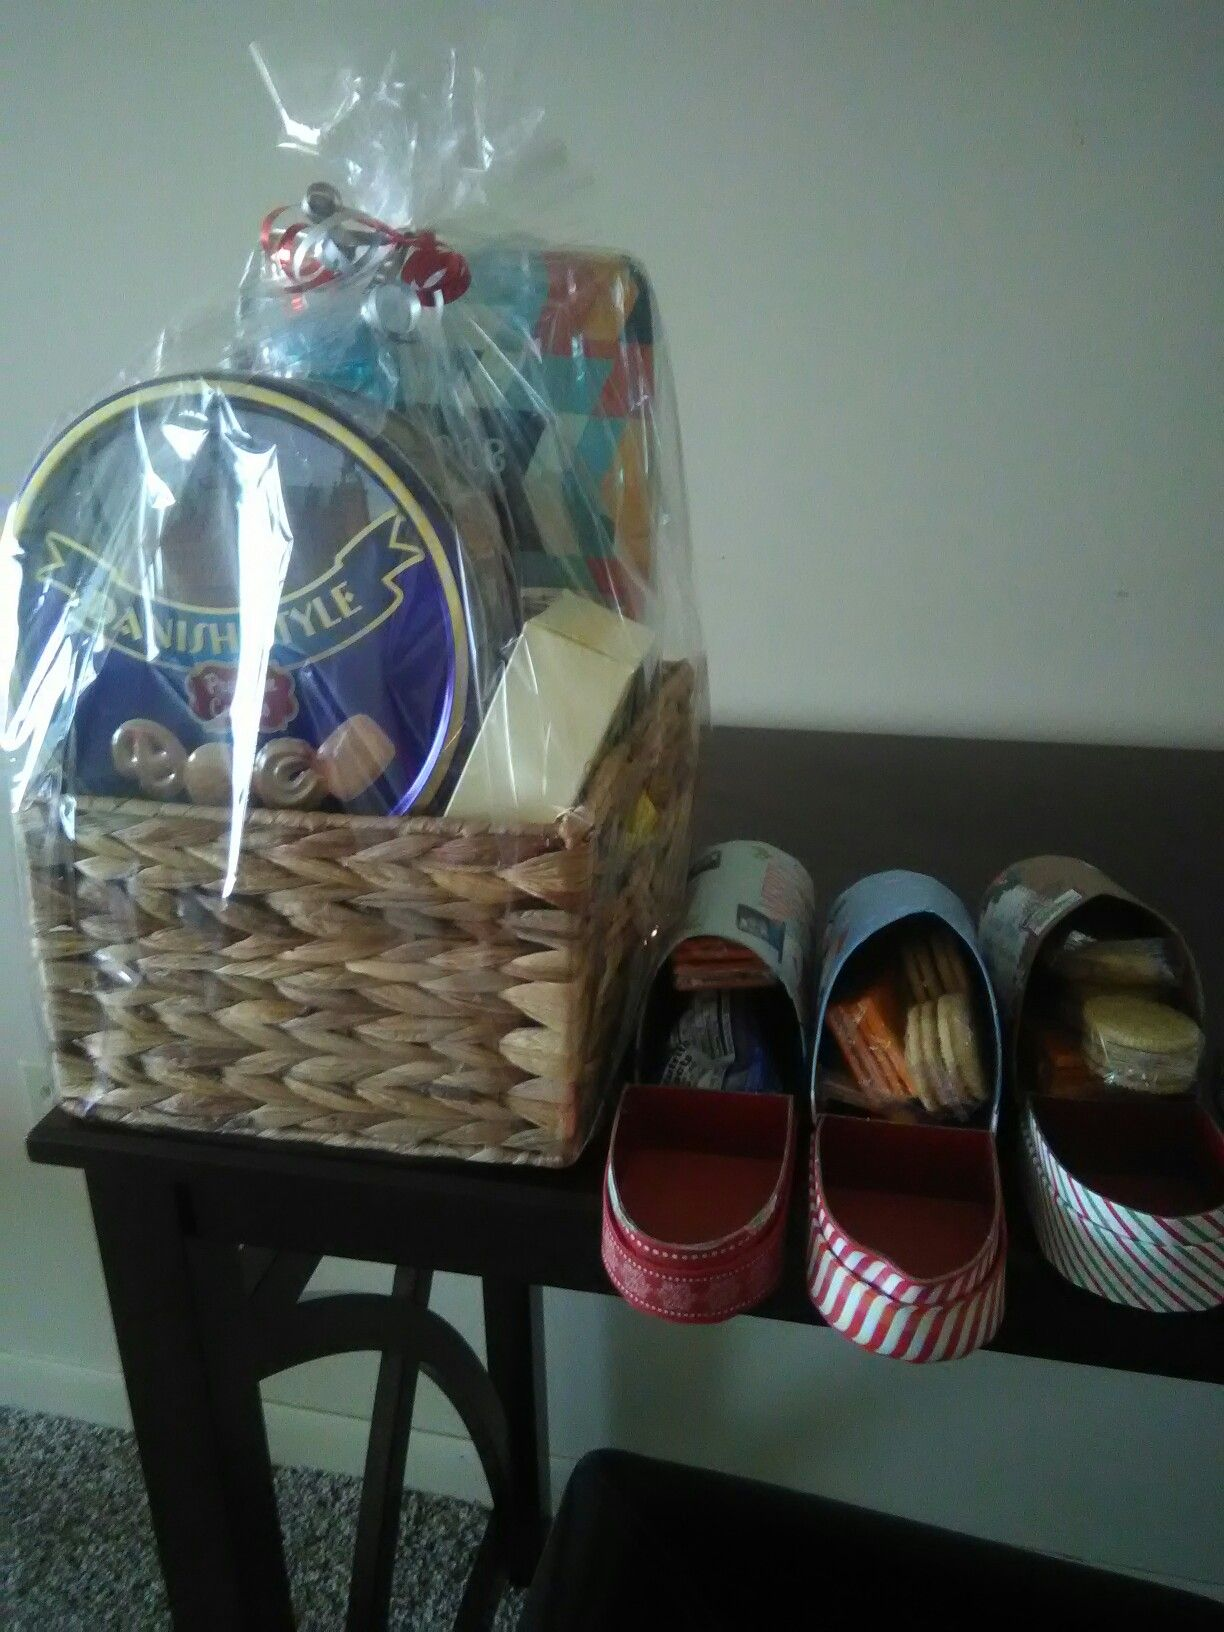 Gift basket n mailbox with goodies inside basket